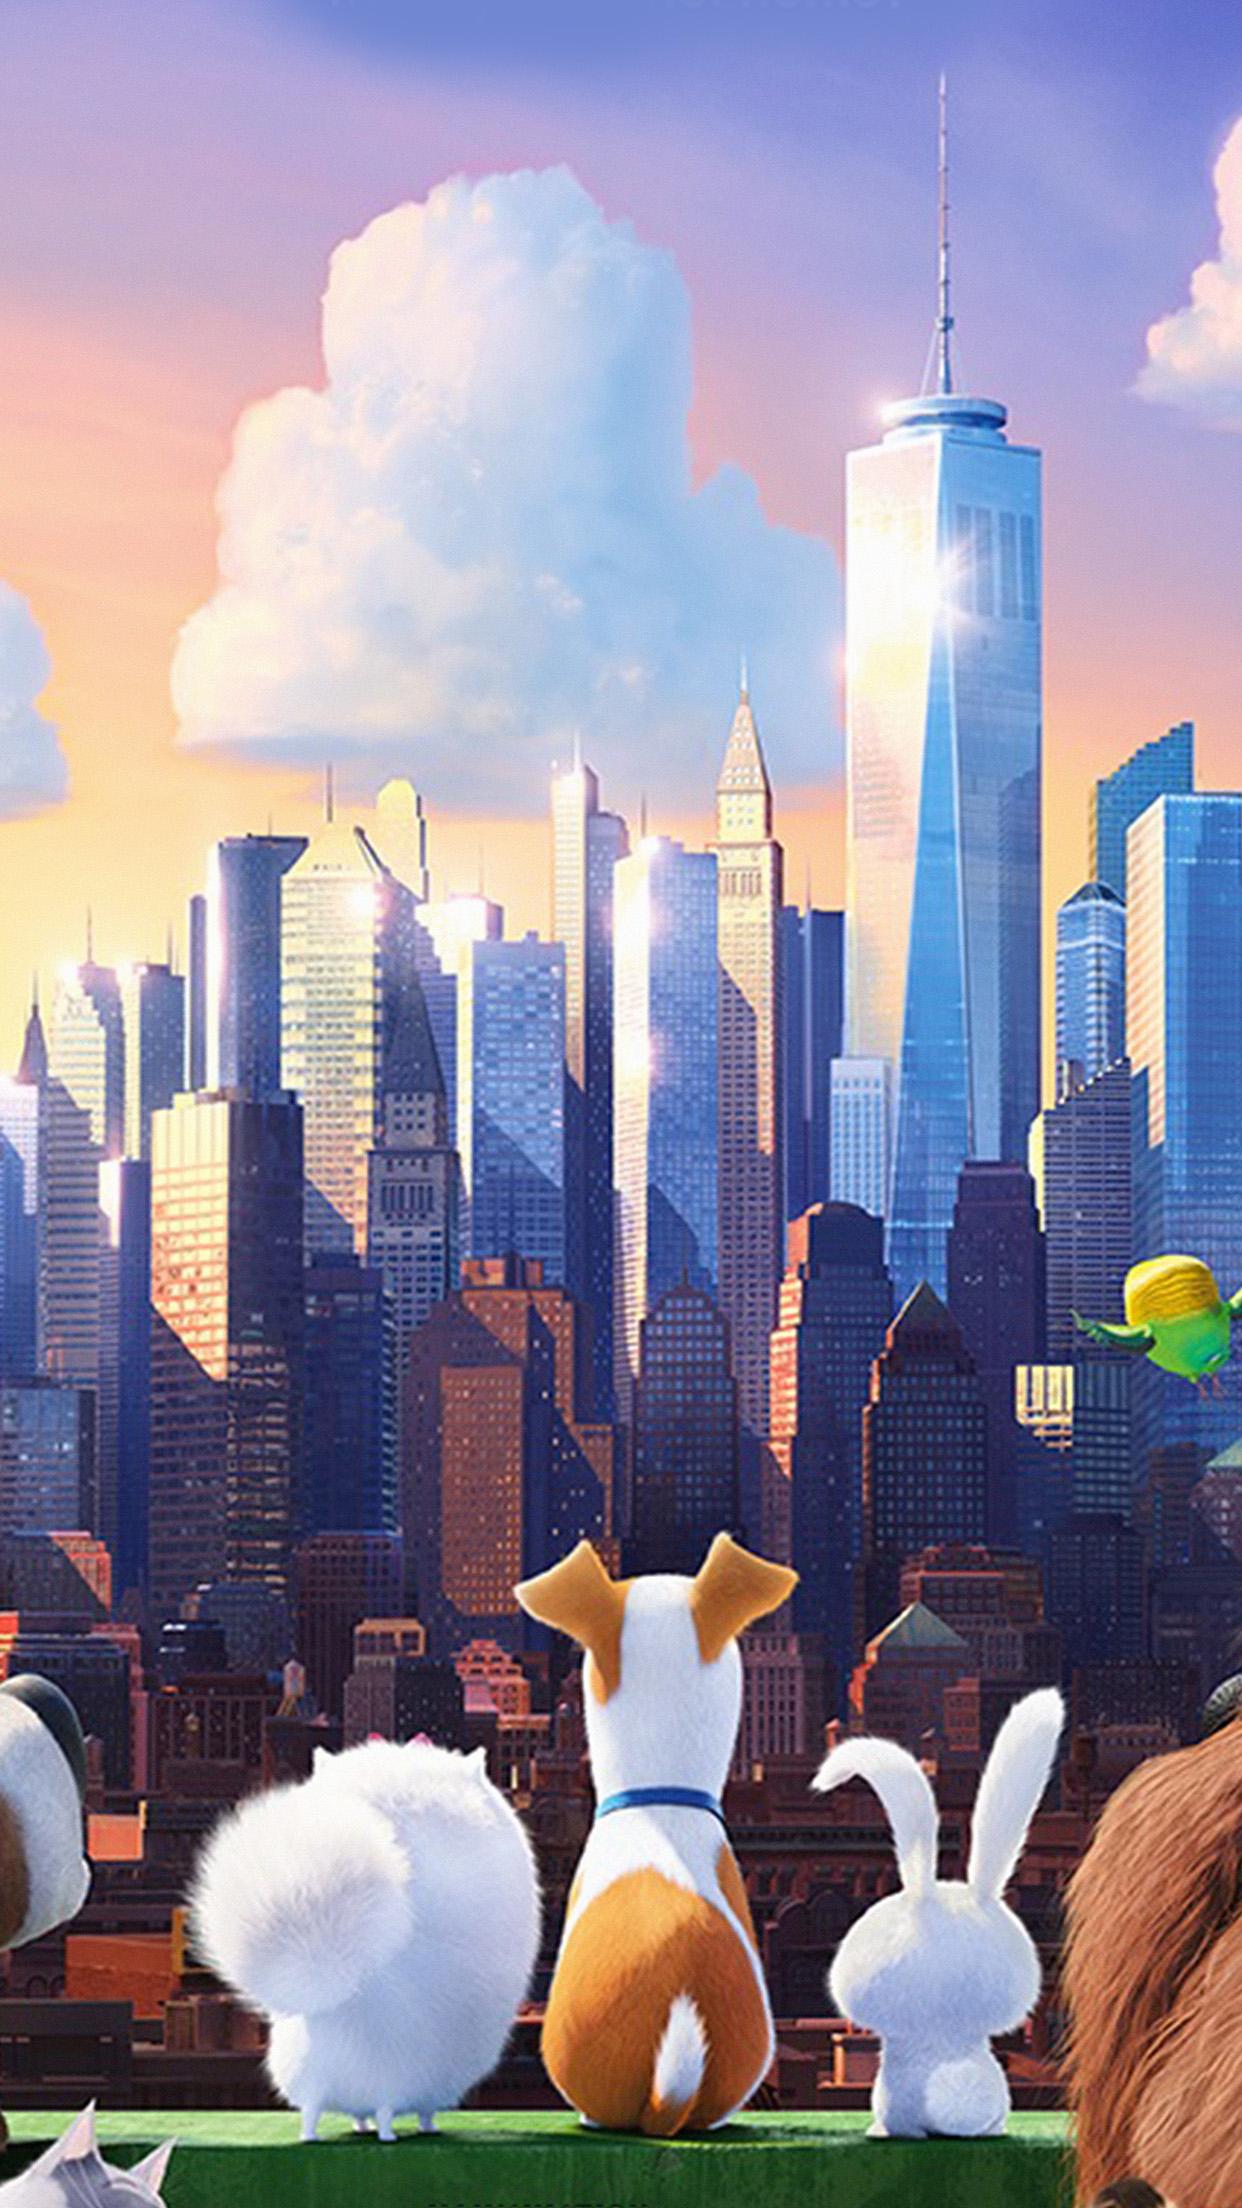 As60 Secret Life Of Pets Animation Art Illustration Wallpaper